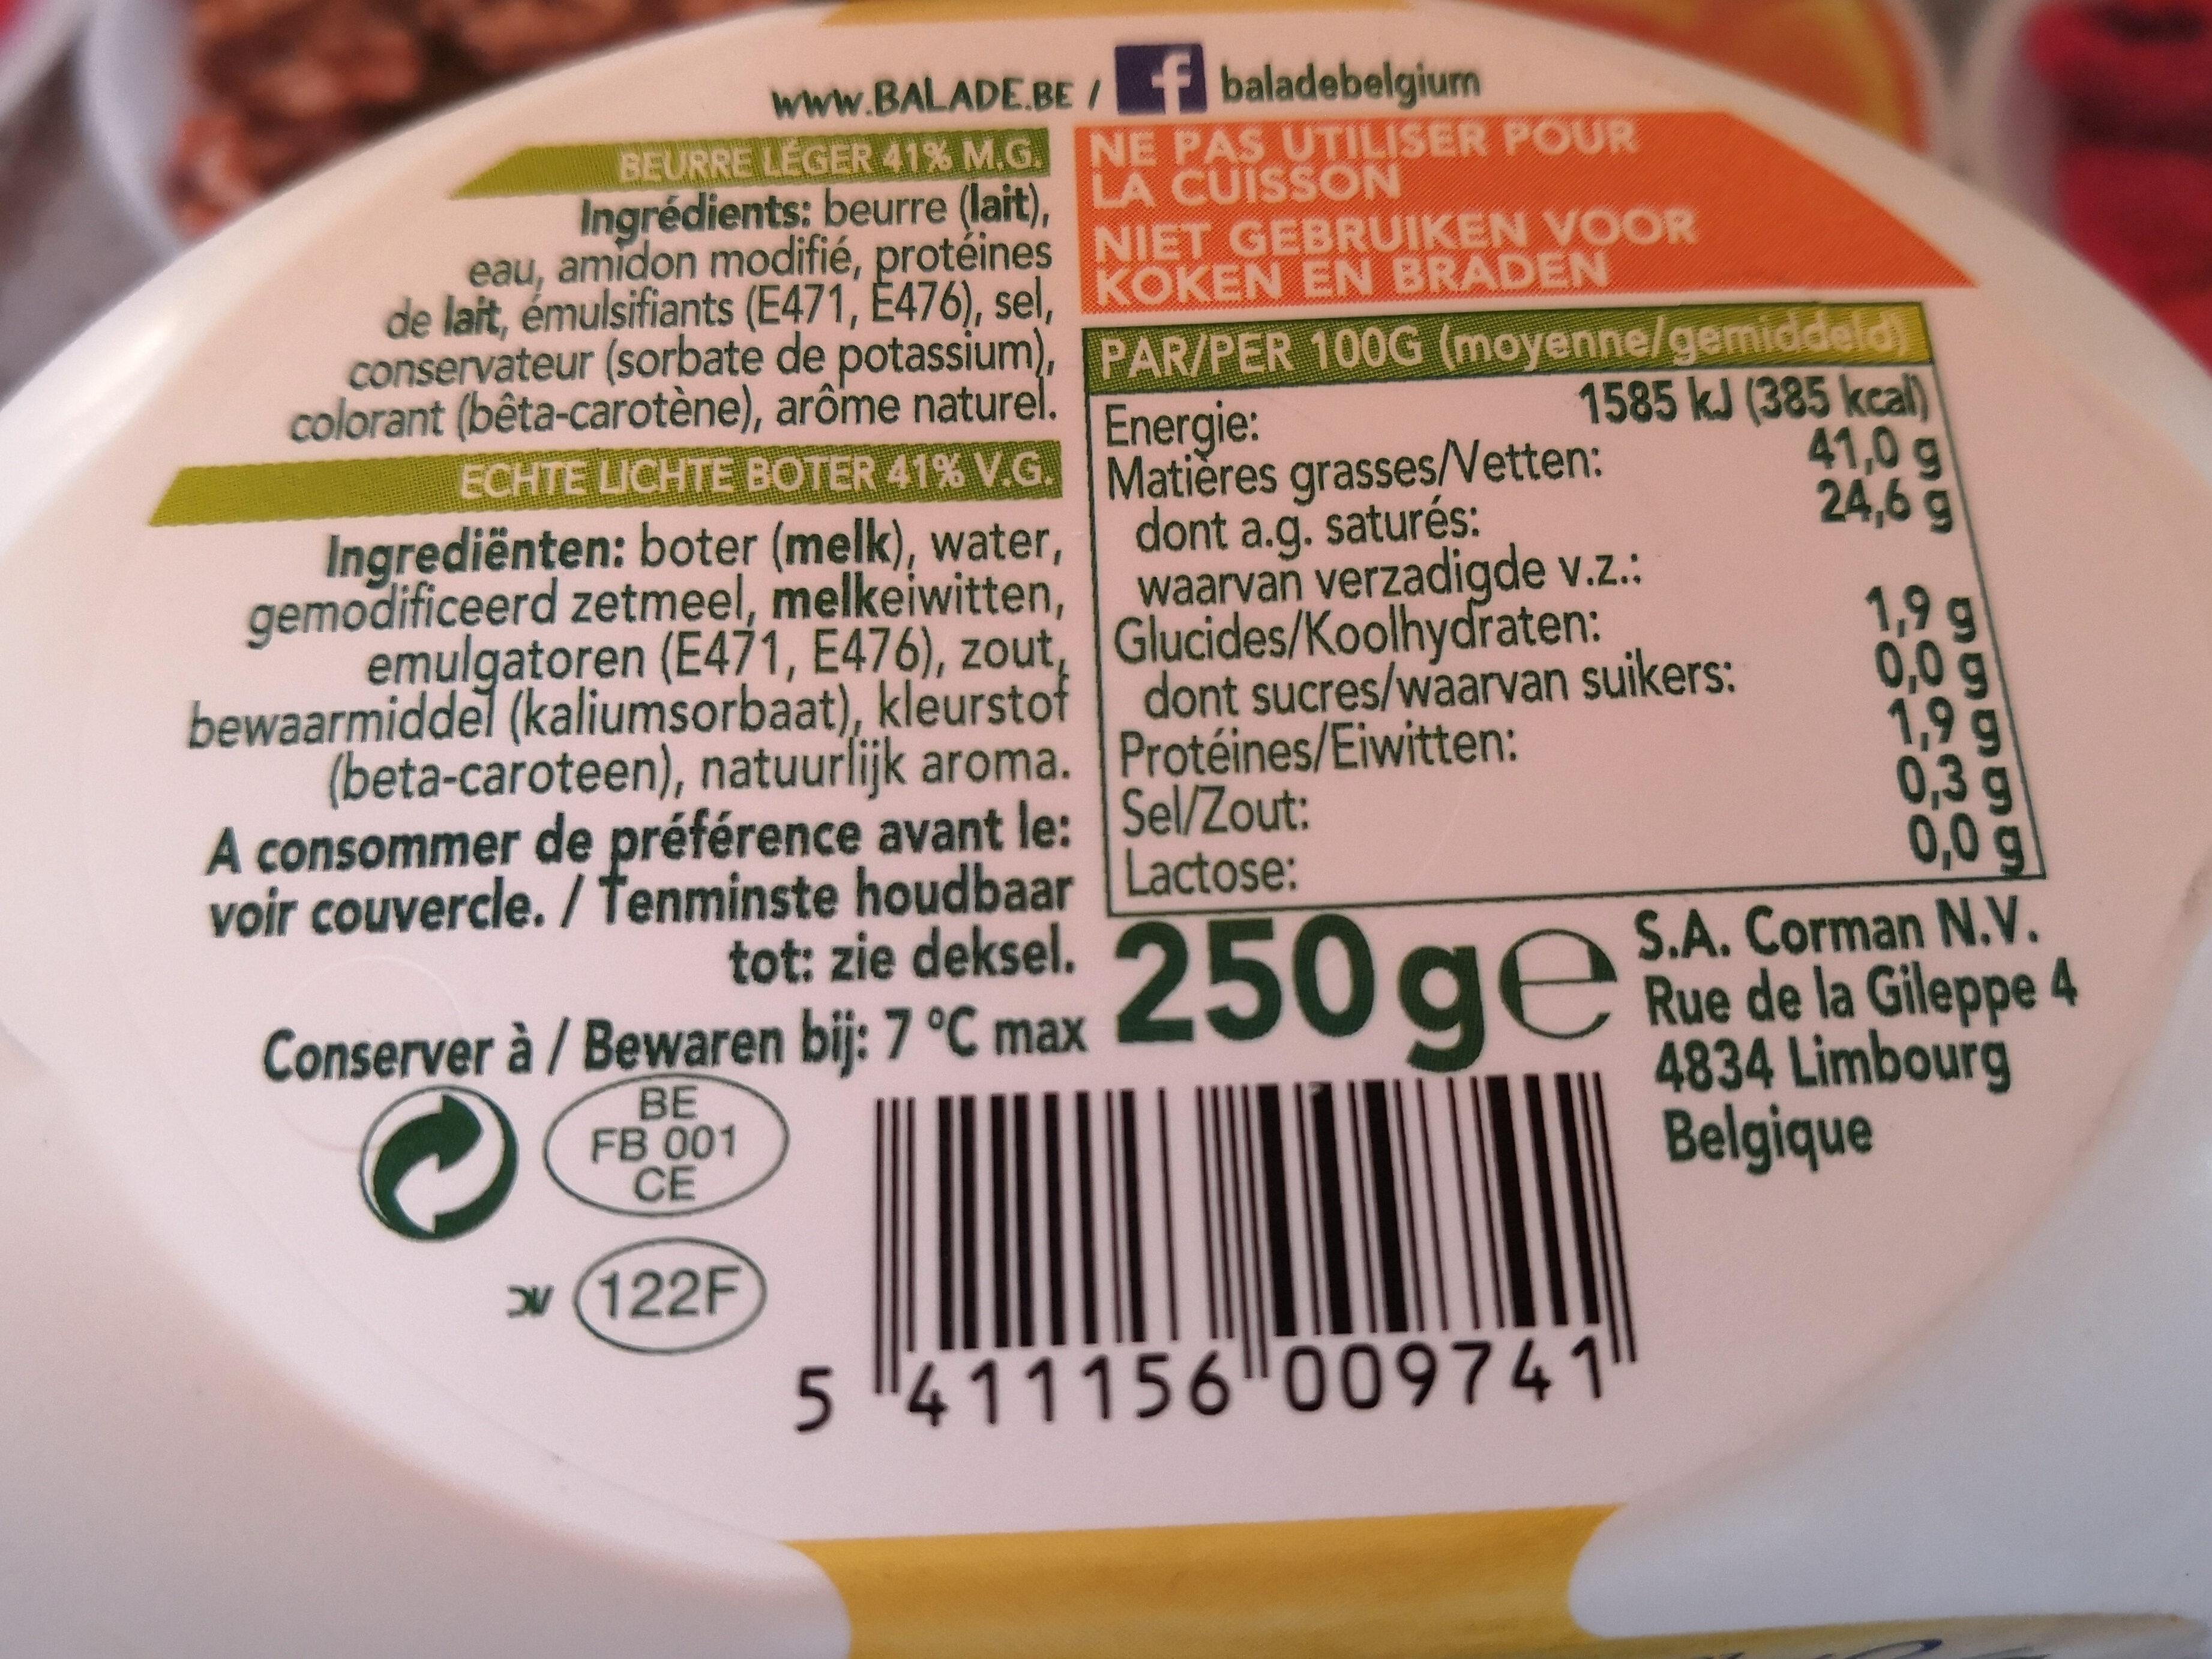 Beurre 0%Lactose - Nutrition facts - fr